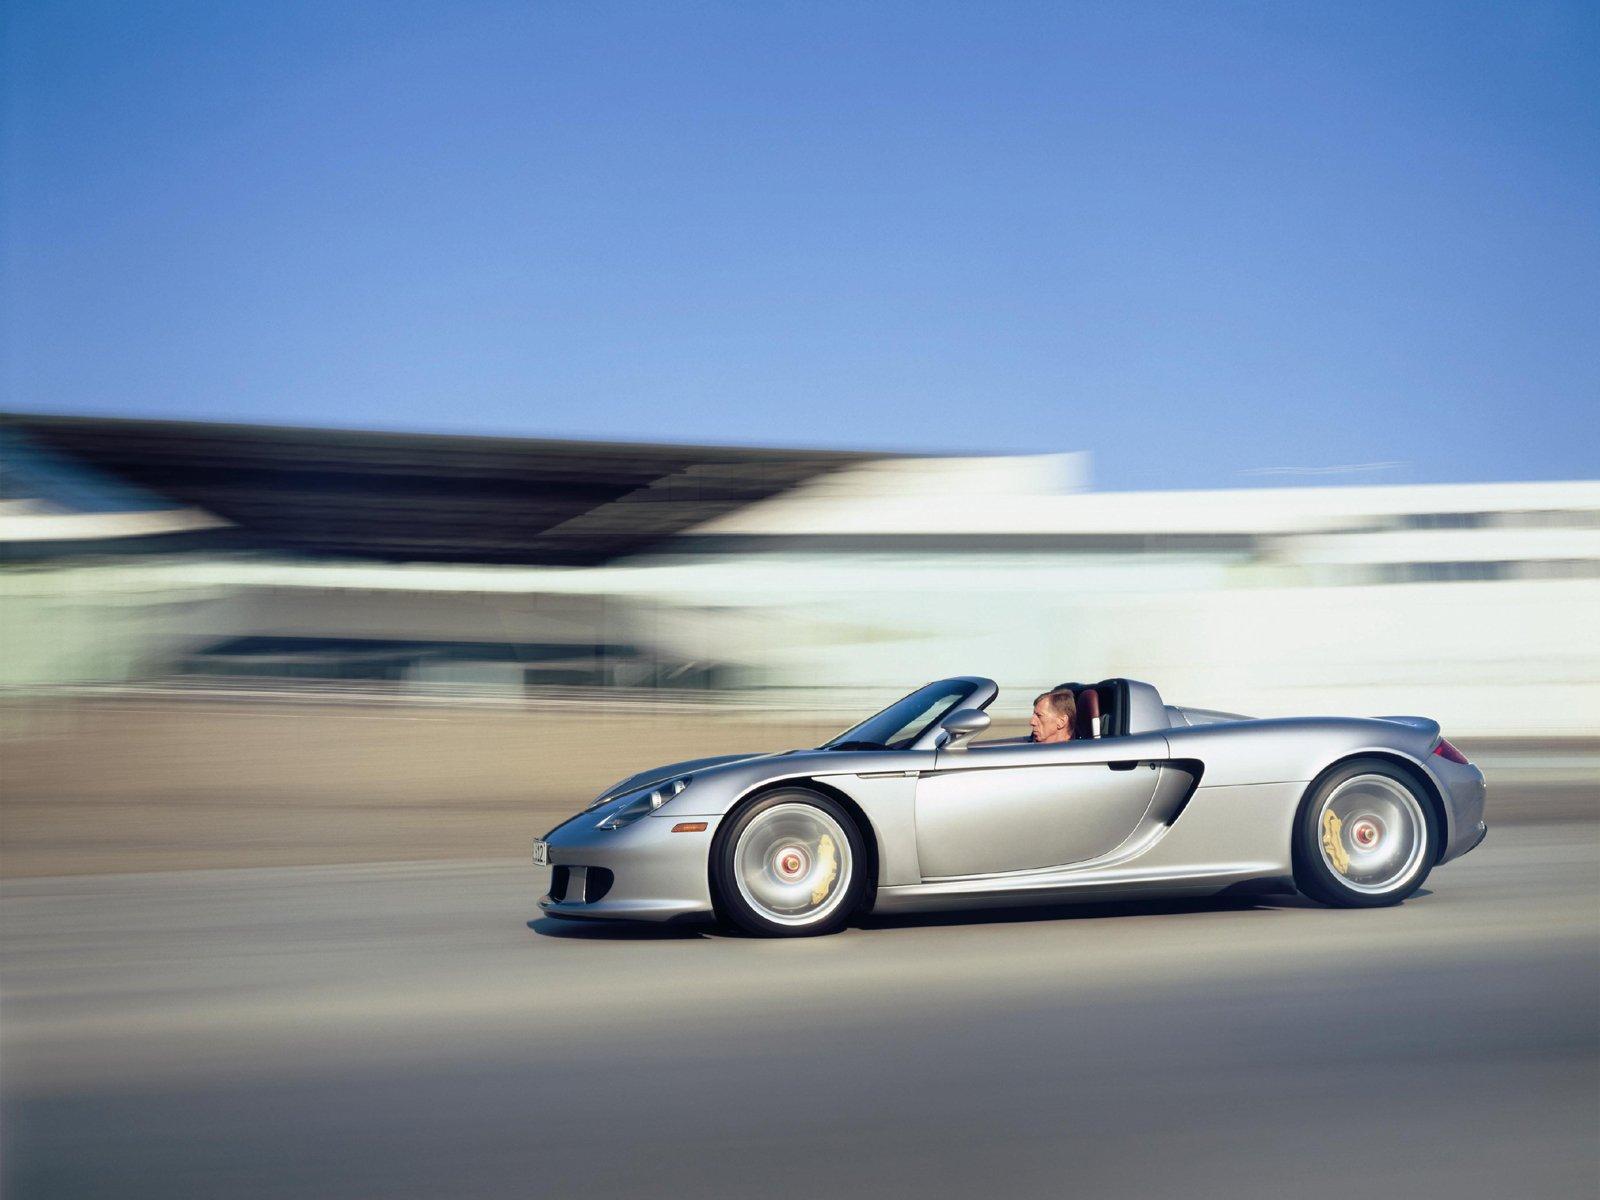 http://3.bp.blogspot.com/-PqzL_sa2i6o/Te0JUvq1gpI/AAAAAAAAAXo/w1IIrE-7cz0/s1600/Porsche%252BCarrera%252BGT%252BWallpapers-6.jpg